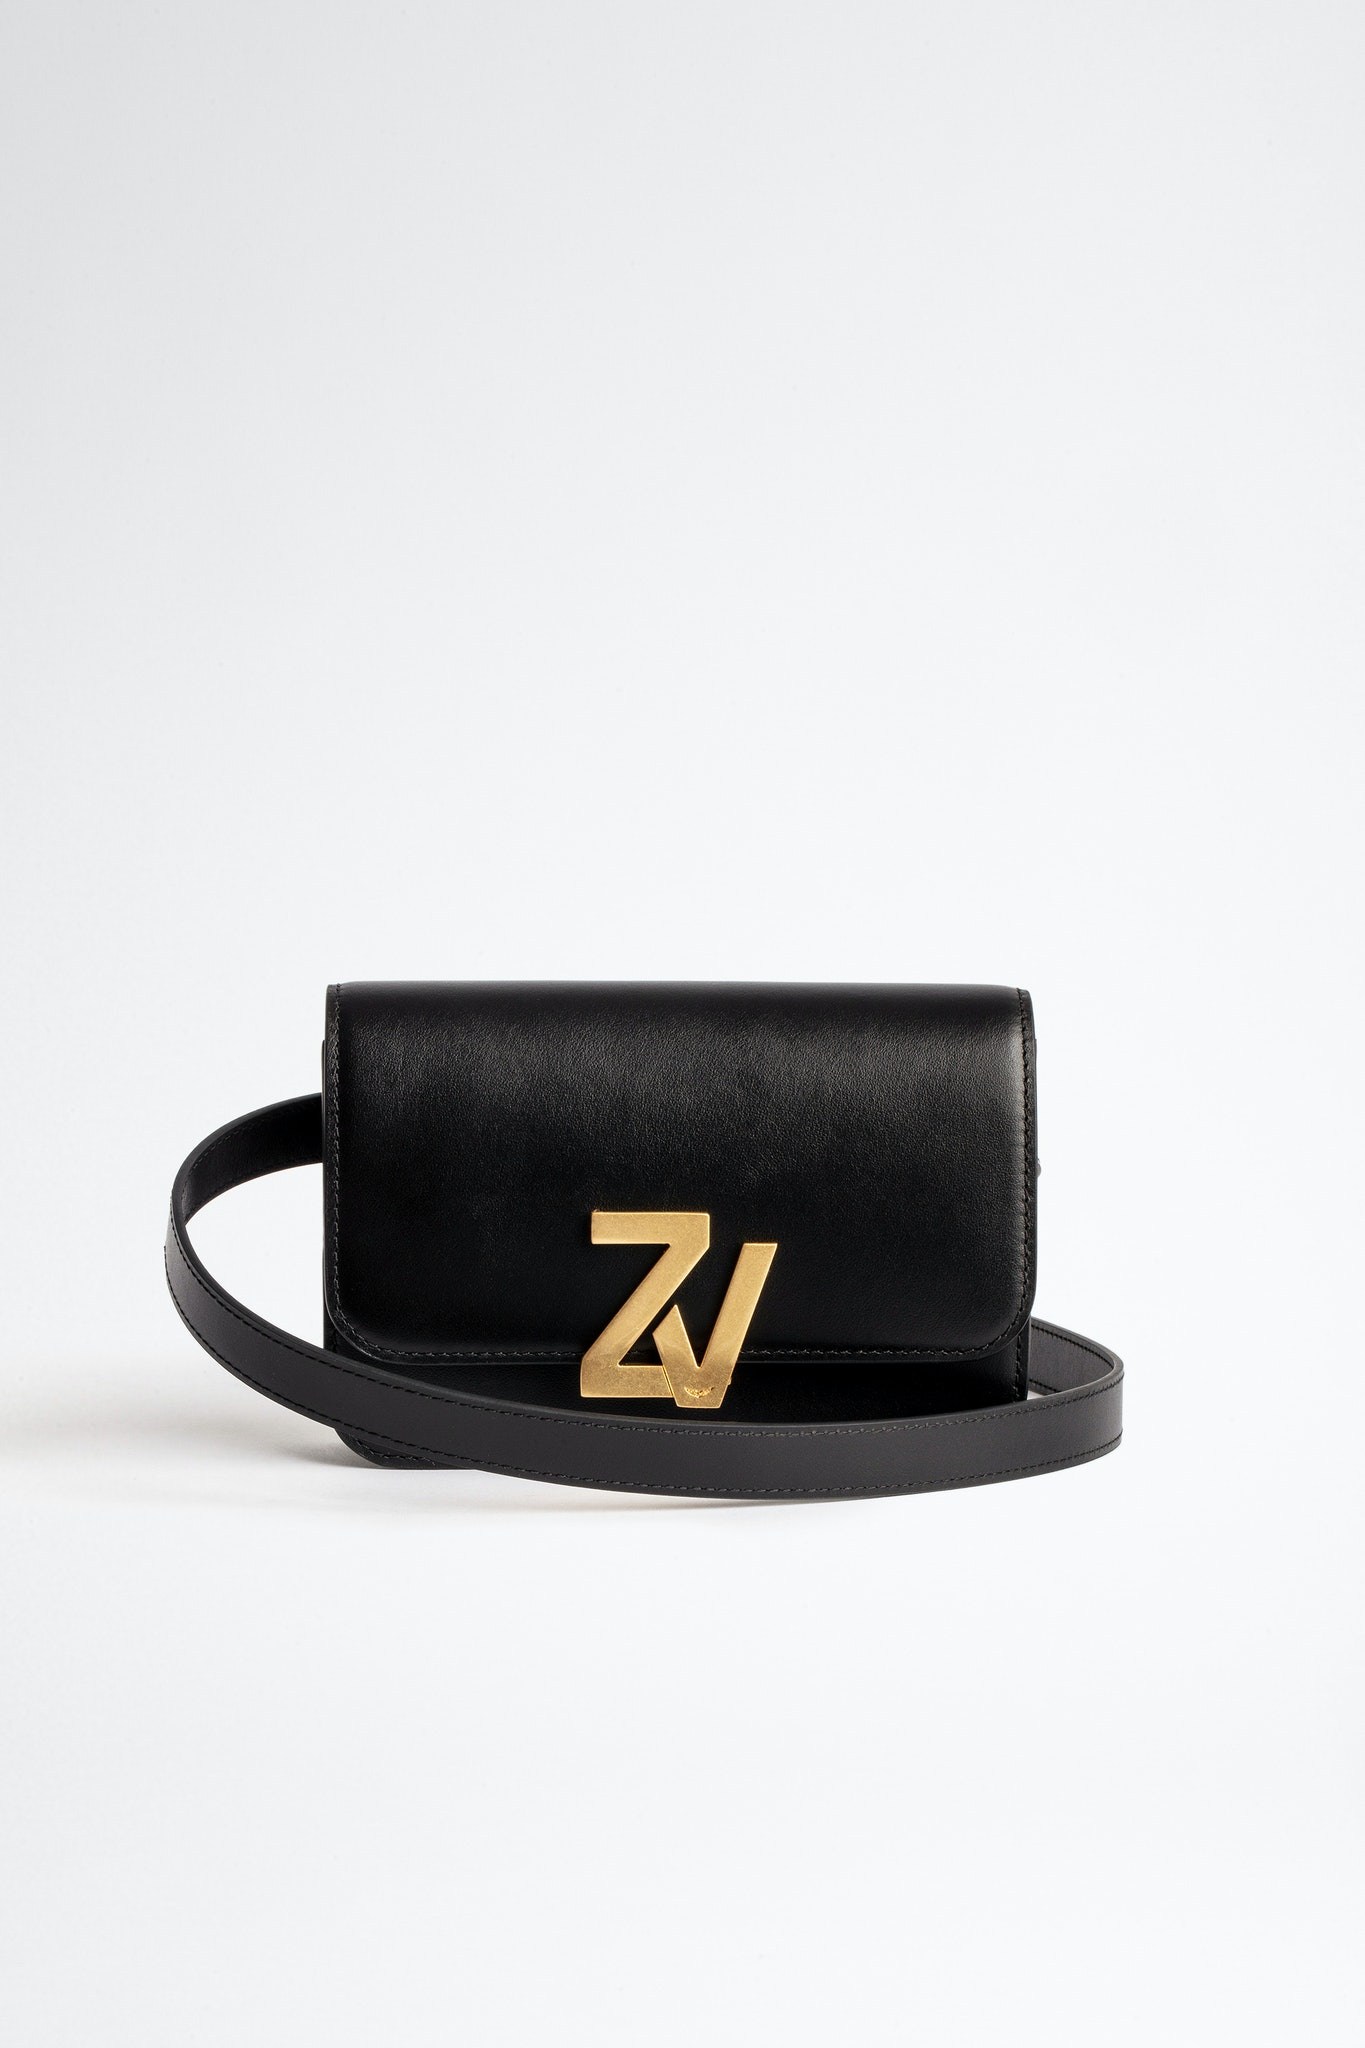 ZV Initiale Le Belt Fanny Pack